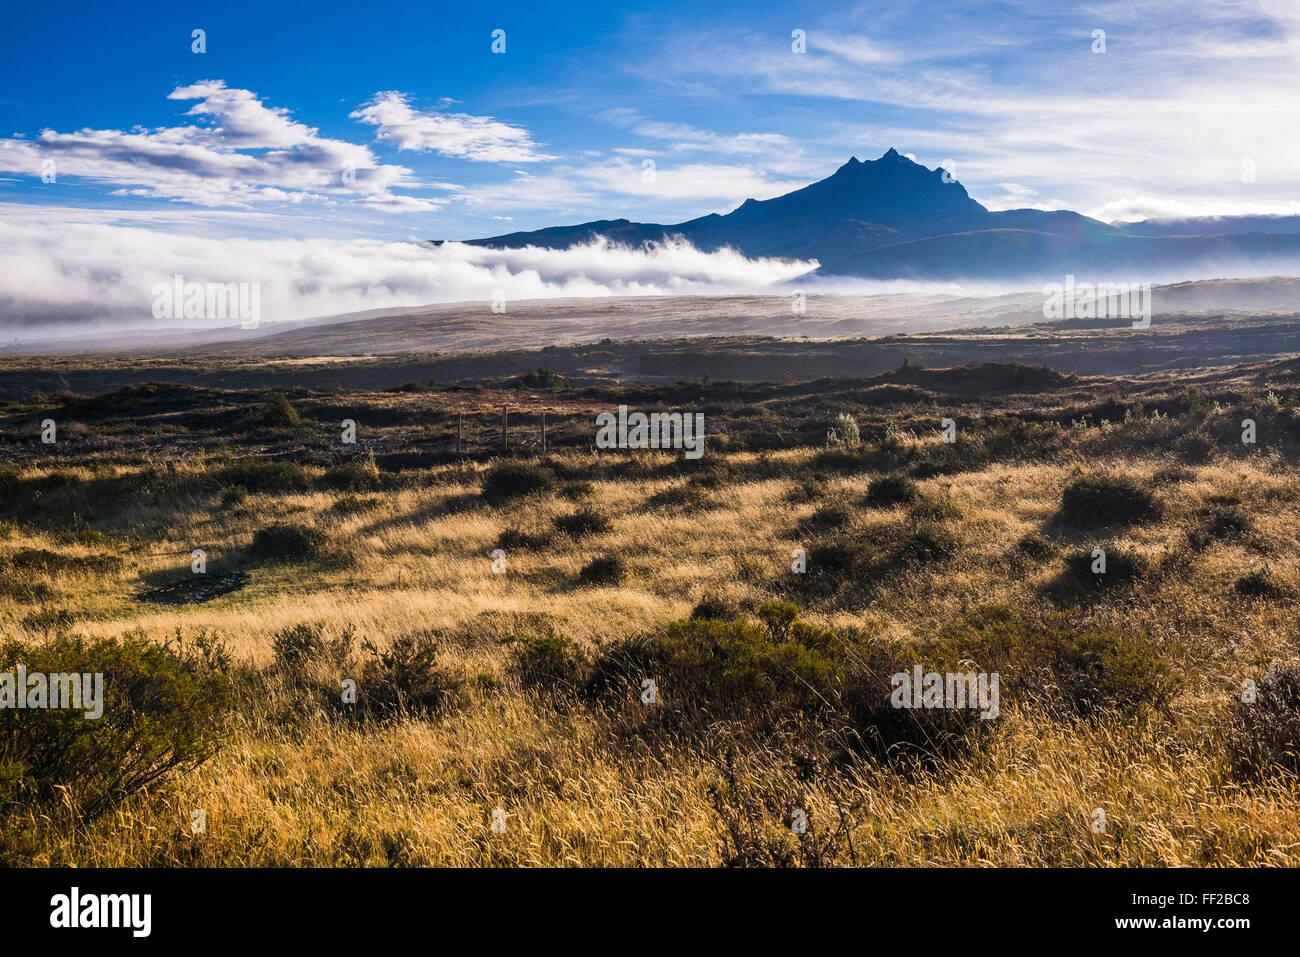 SinchoRMagua VoRMcano bei Sonnenaufgang, Provinz Cotopaxi in Ecuador, Südamerika Stockbild